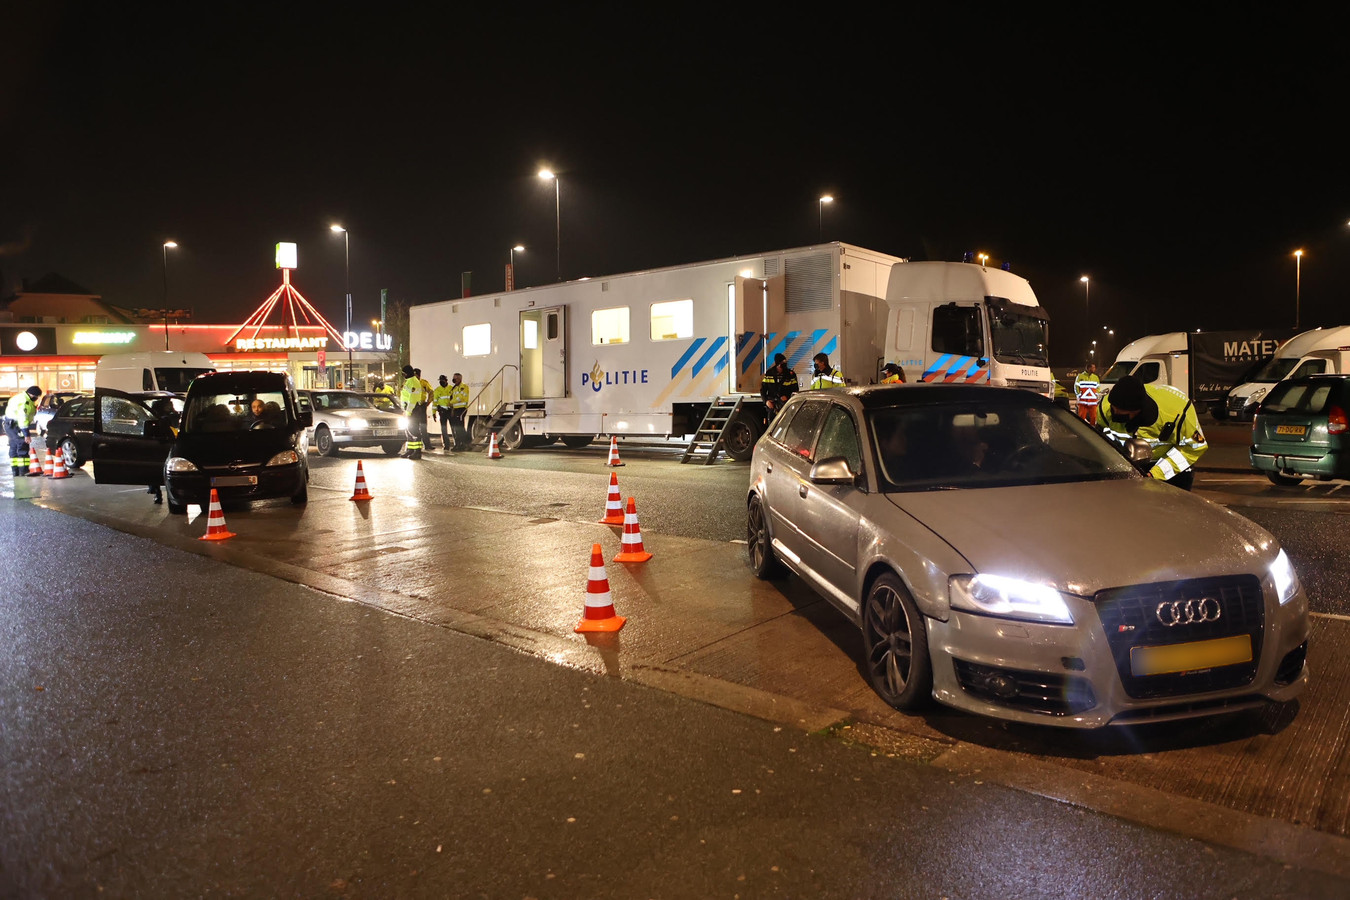 Grote politiecontrole langs A2 bij Zaltbommel na ingang van avondklok.